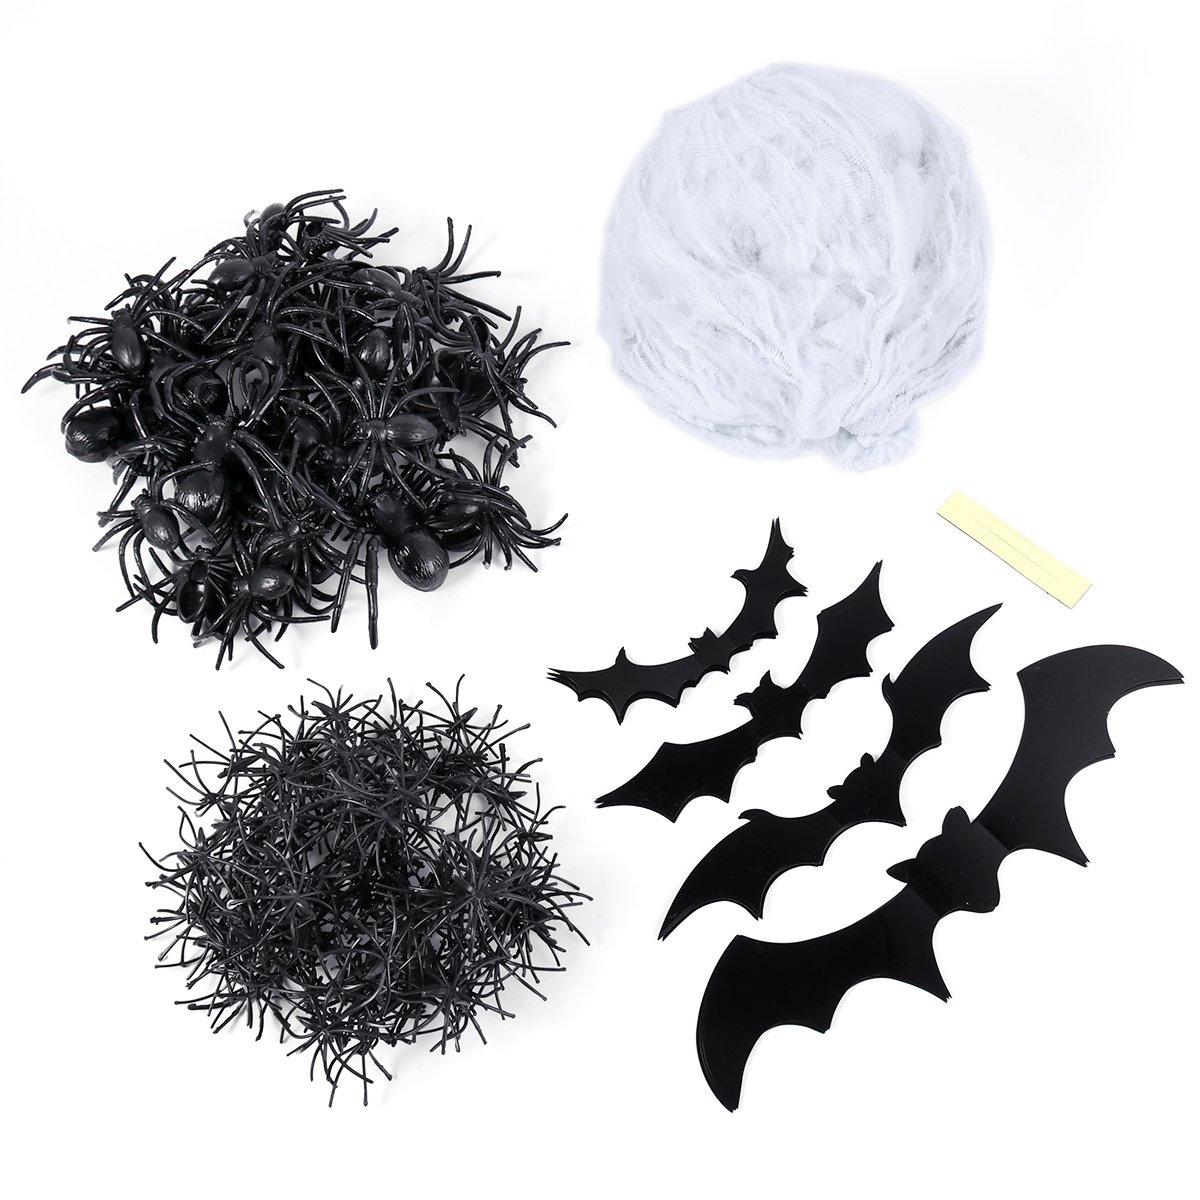 TOYMYTOY TOYMYTOY Halloween White Spider Web Cobweb Decoration Set for Haunted House (100g Cotton Web + 4pcs Large Spiders + 100pcs Small Spiders + 40pcs Medium Spiders + 20pcs Bats)